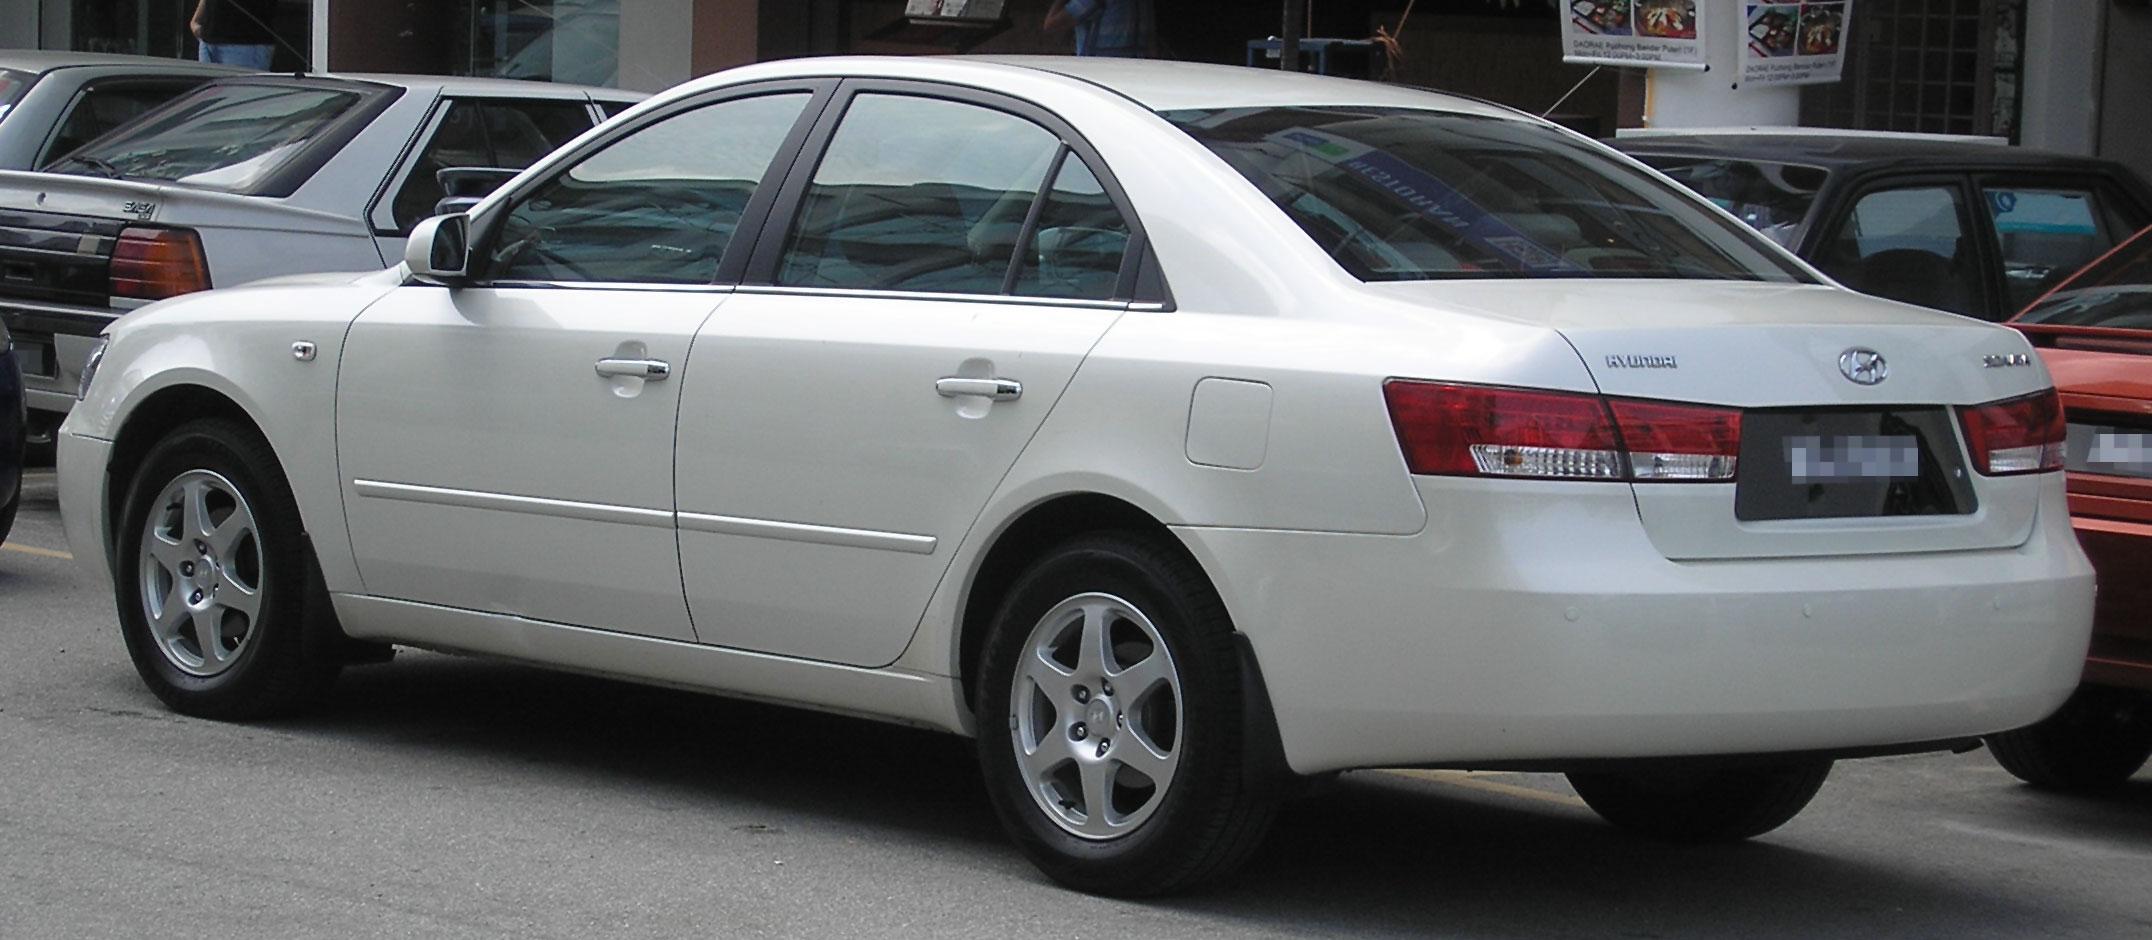 File Hyundai Sonata Fourth Generation Rear Serdang